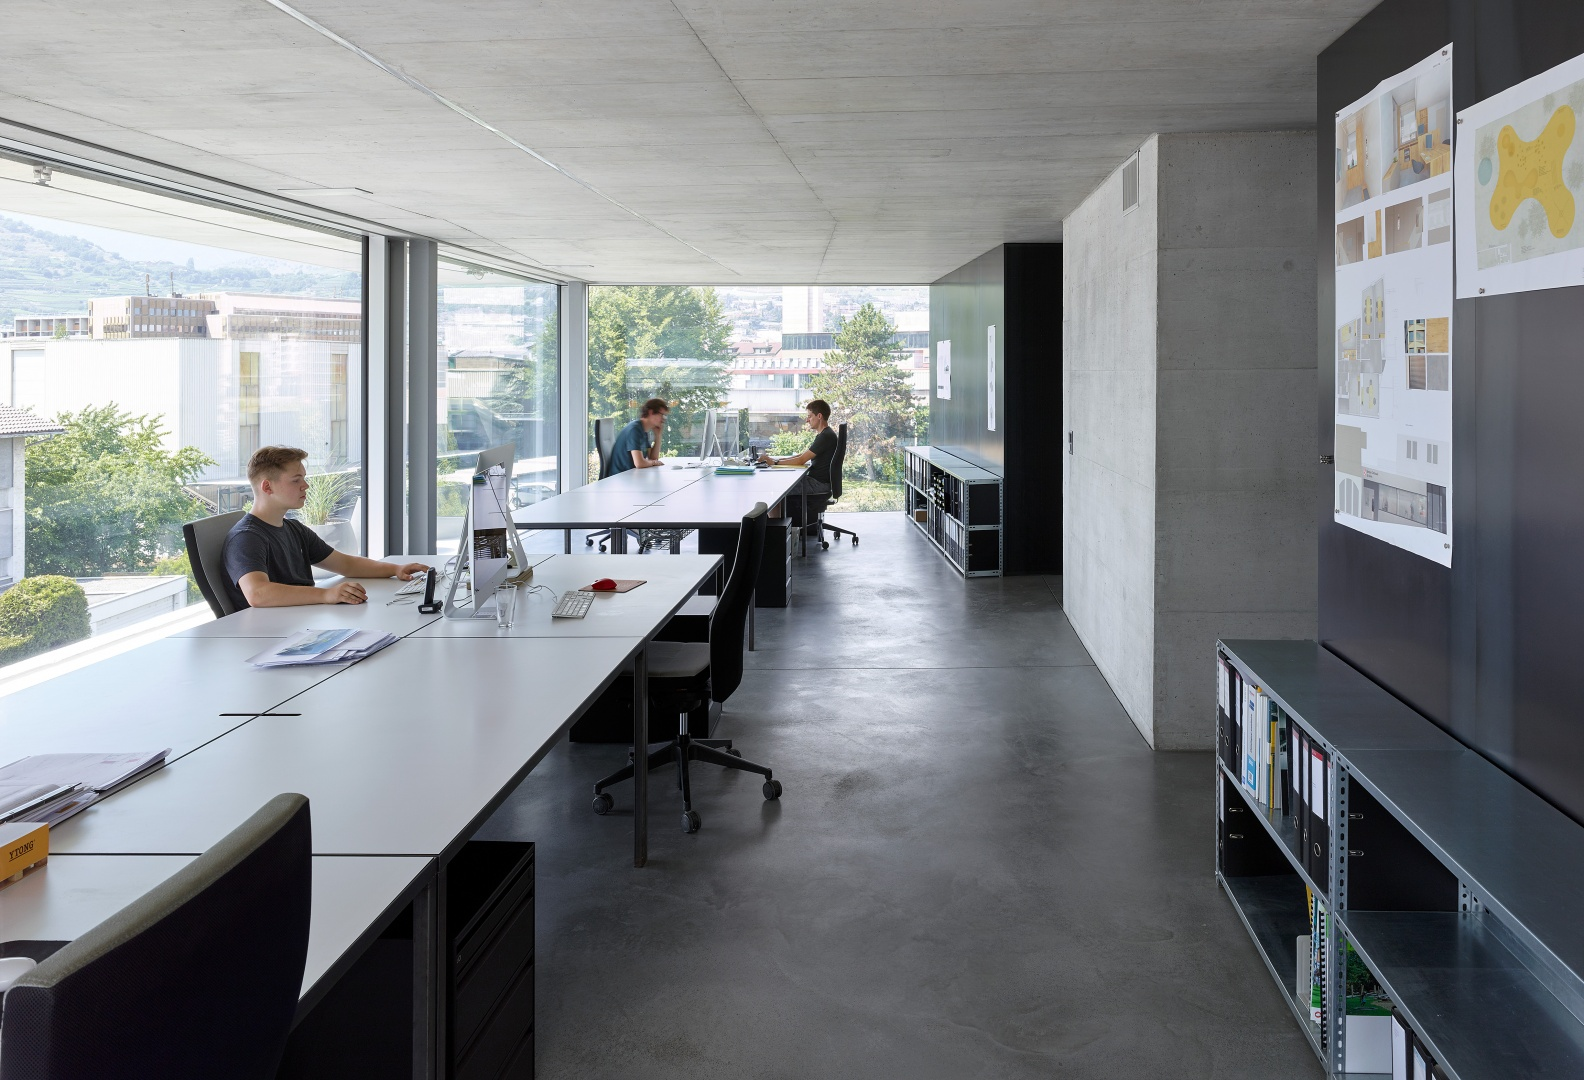 immeuble ronquos 35 savioz fabrizzi open space © thomas jantscher